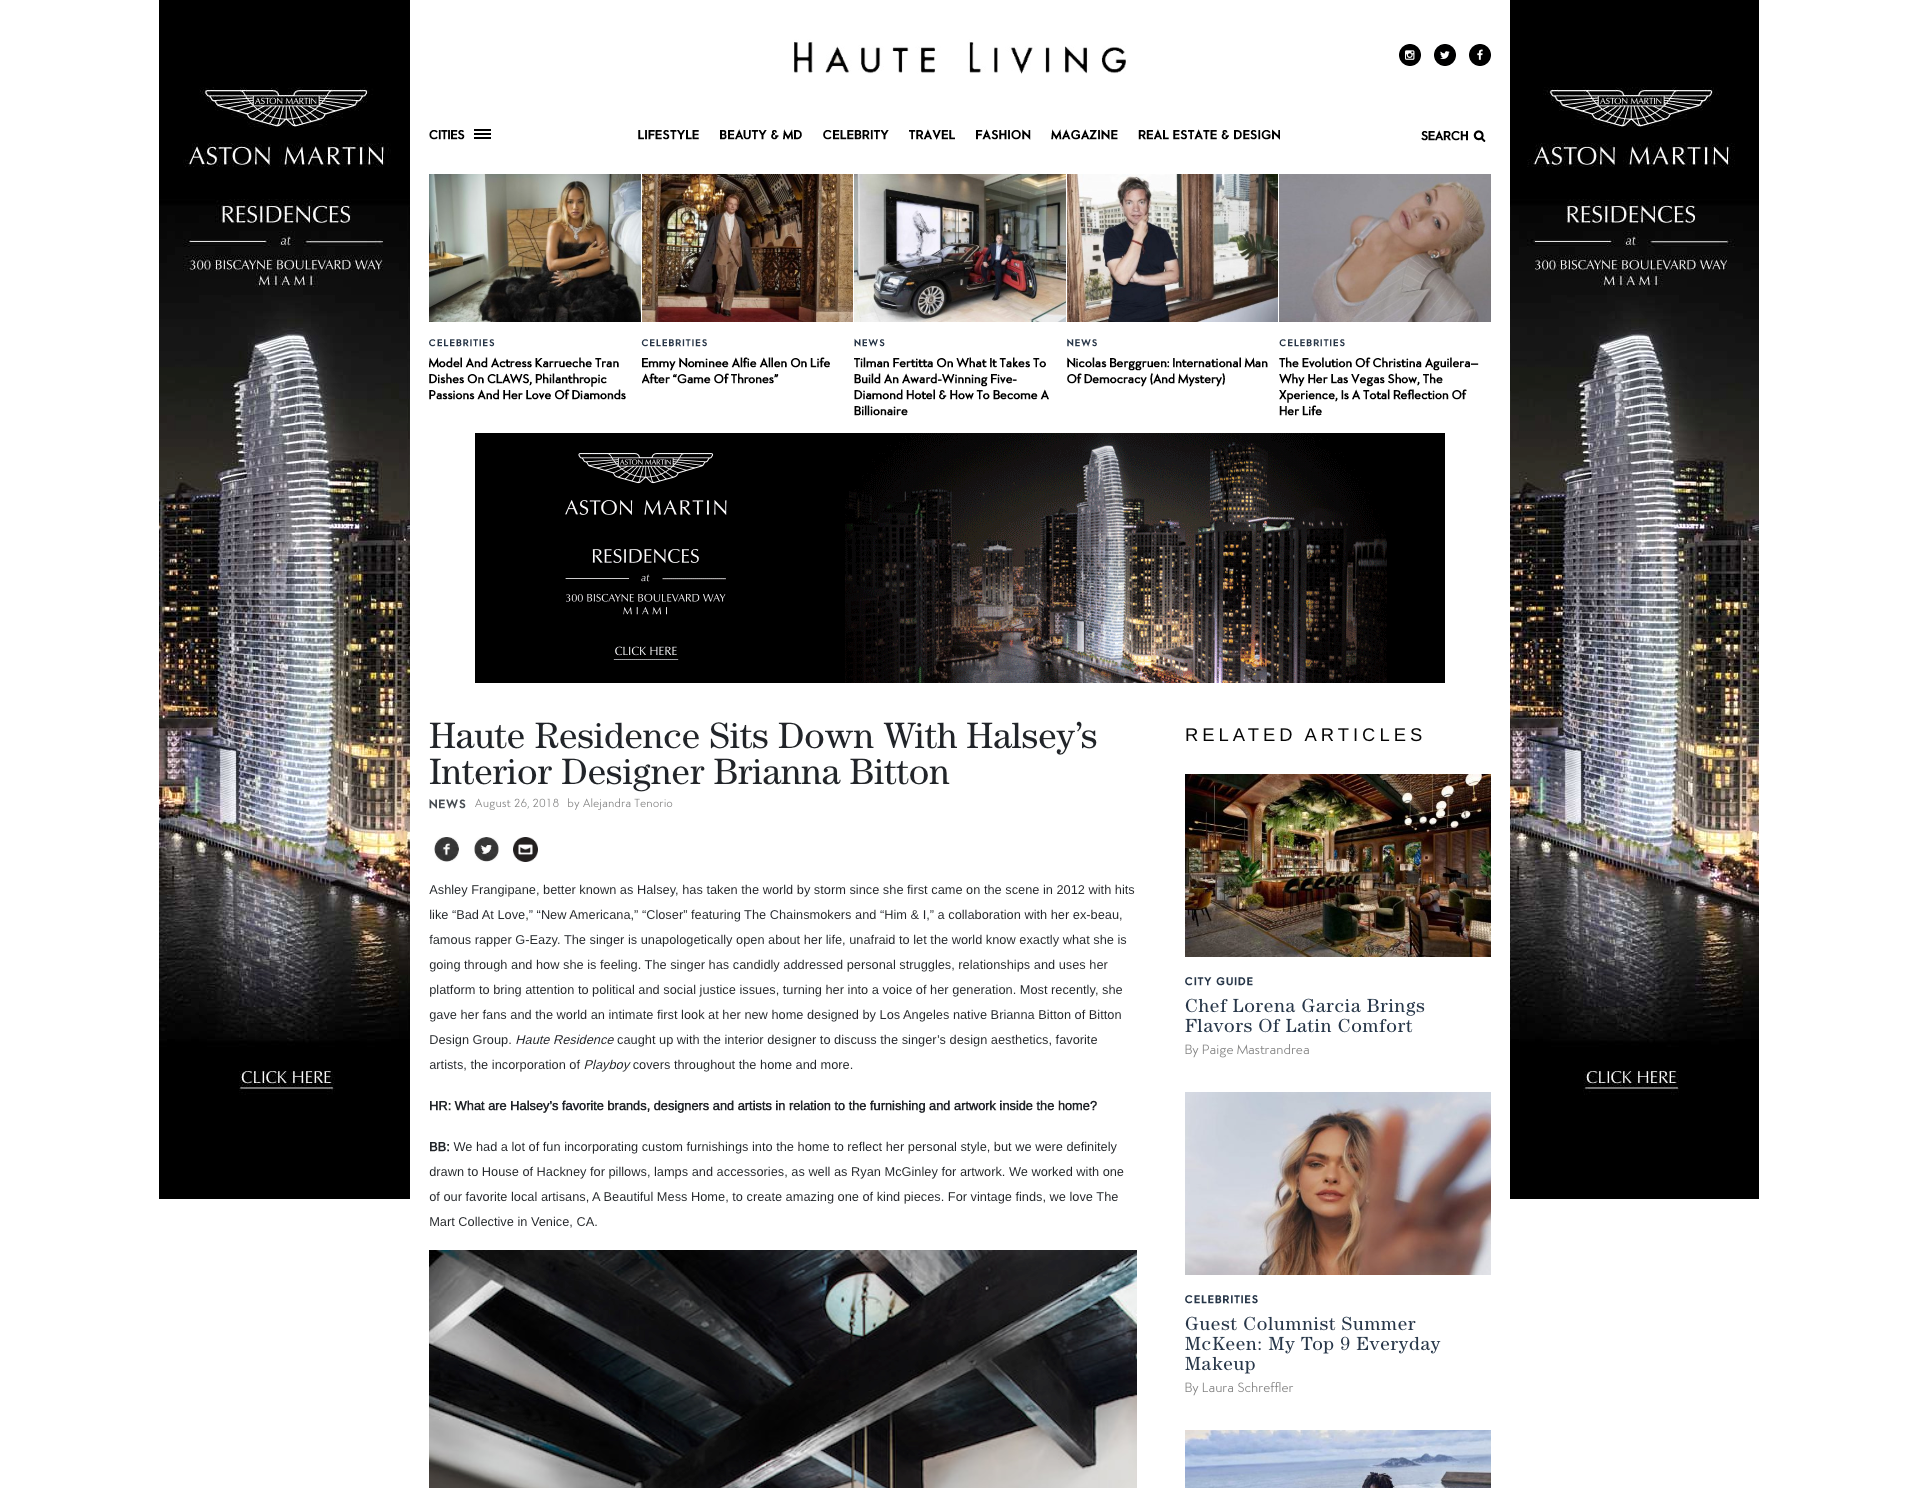 Haute Living - Hollywood Hills Residence